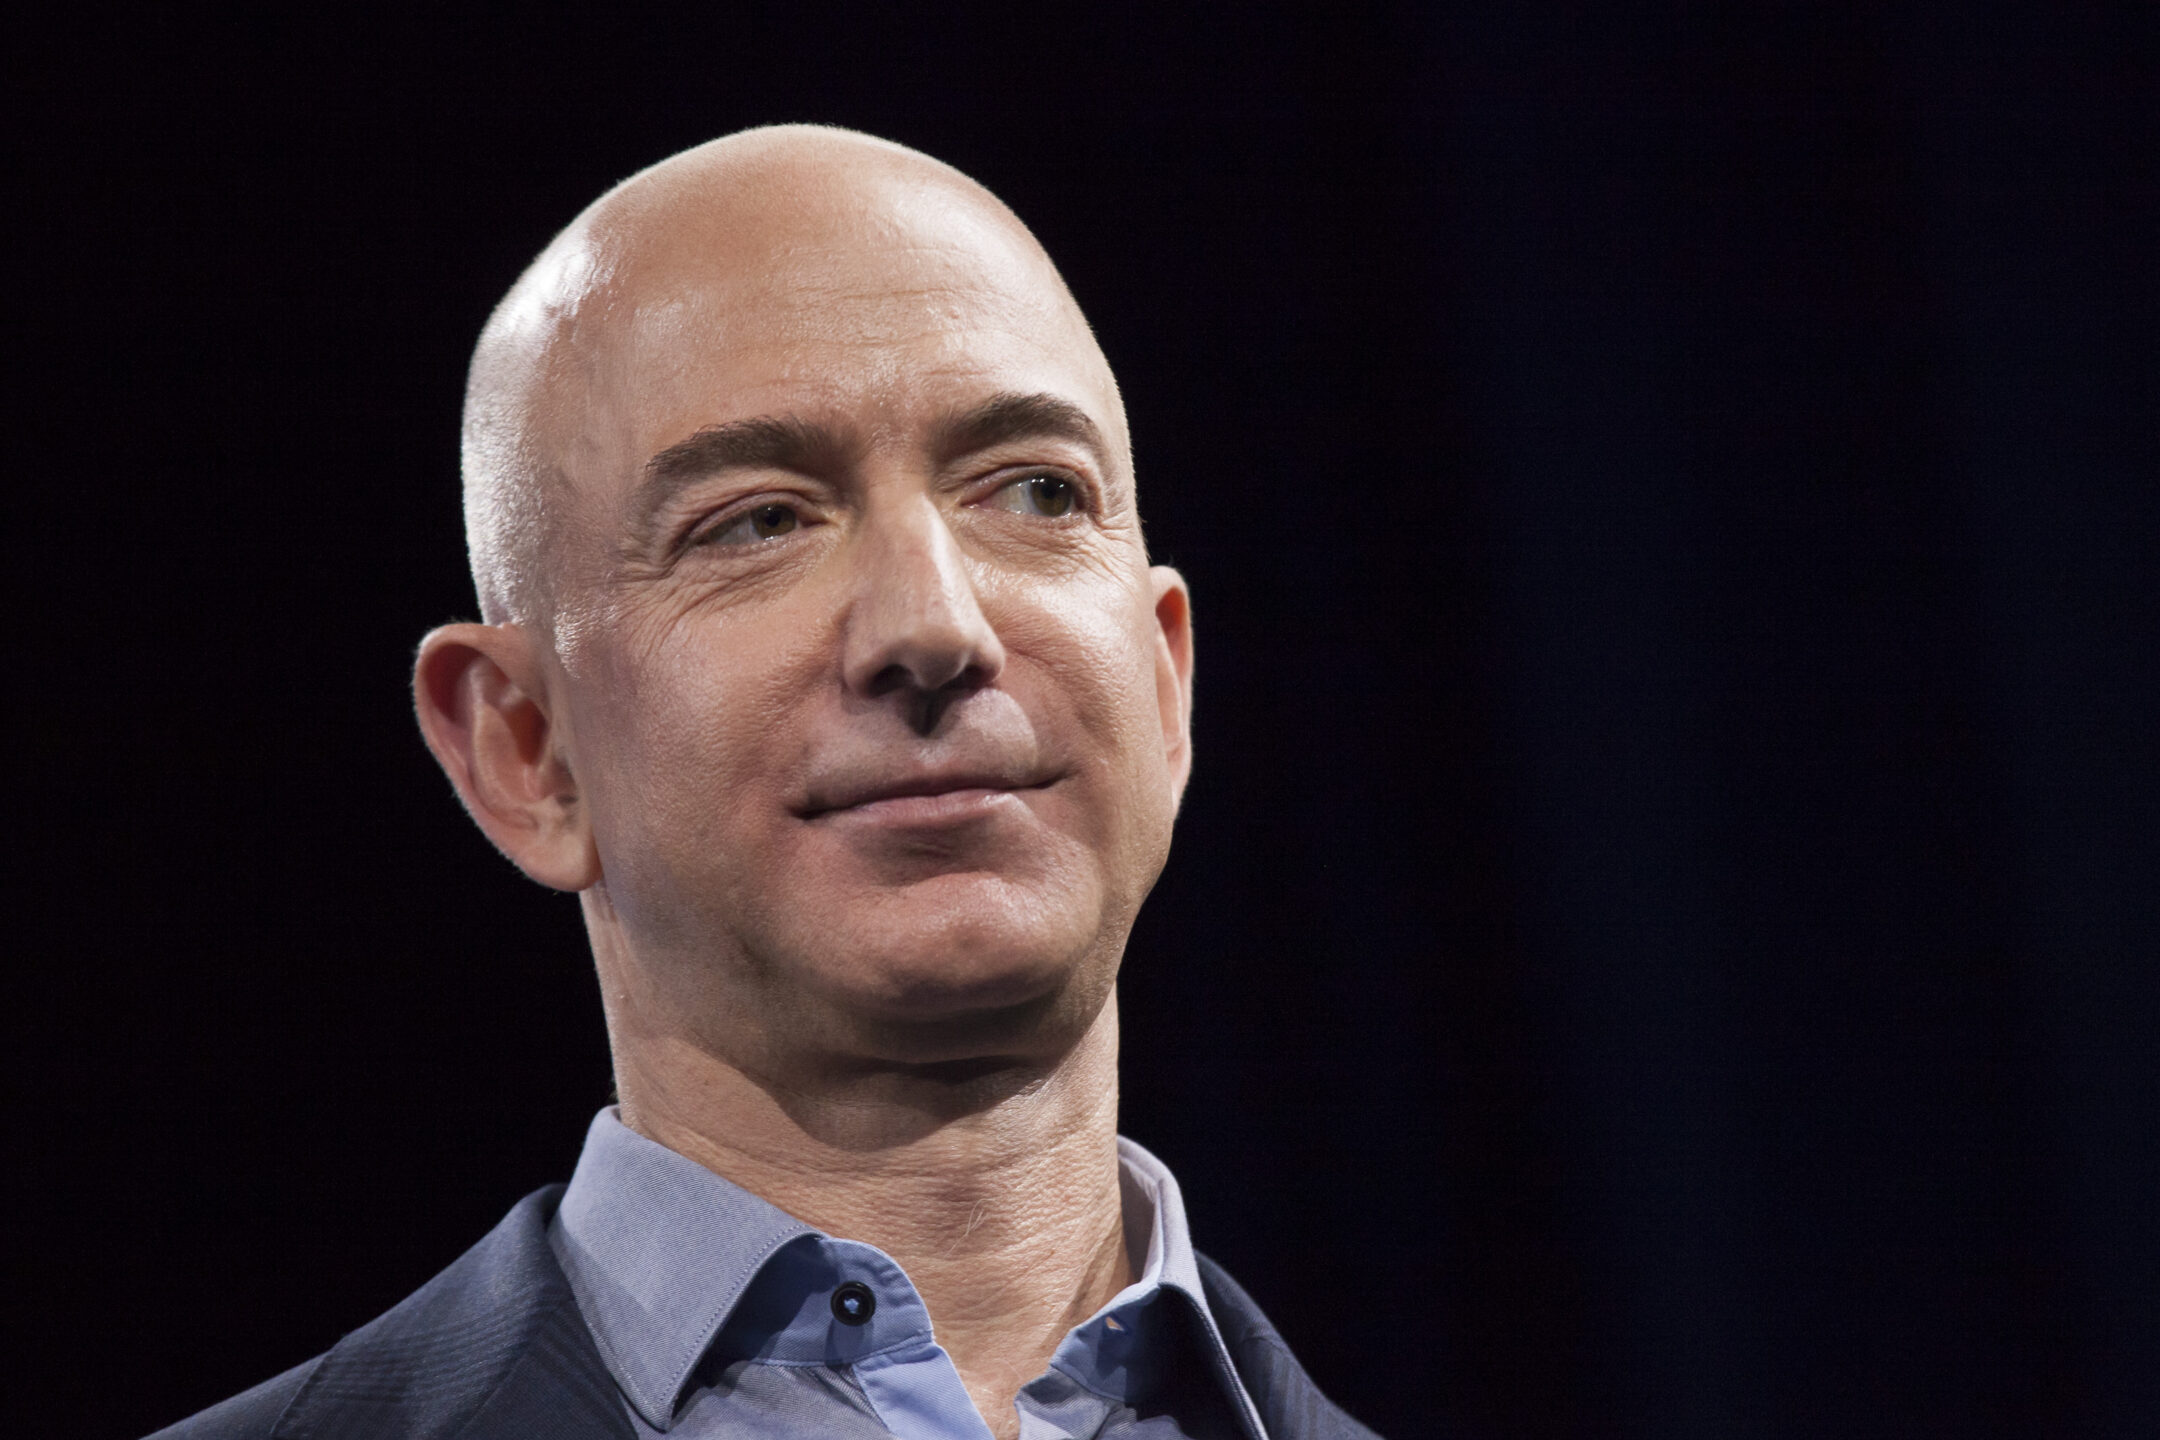 Jeff Bezos Amazon Prime Video